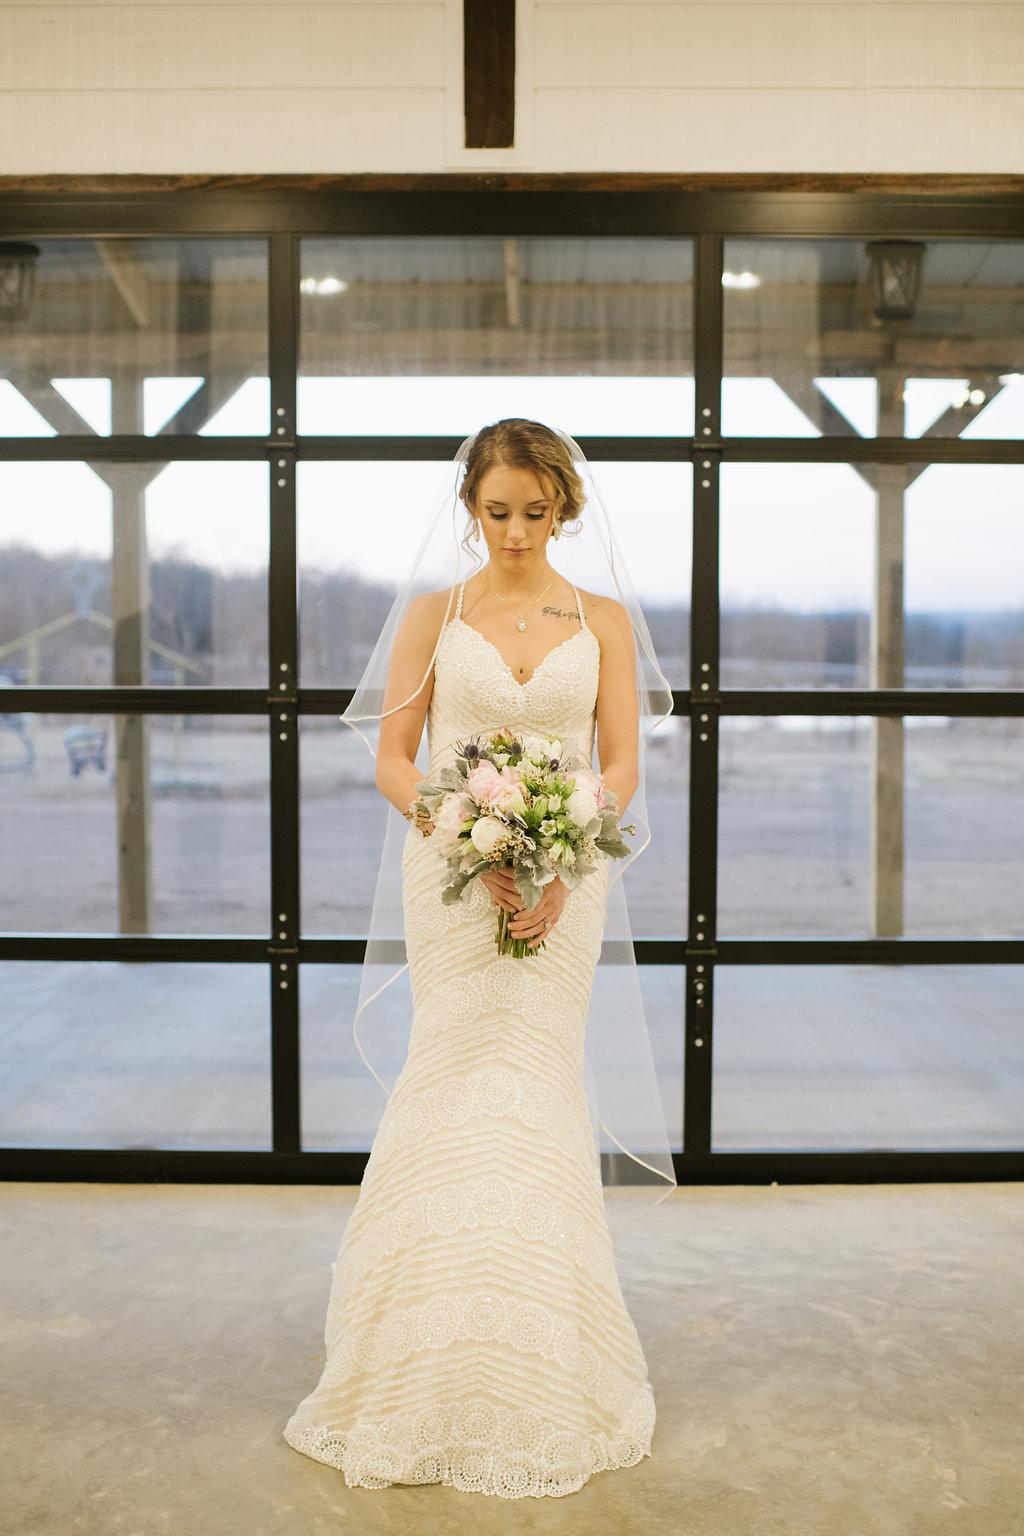 Tulsa Wedding Venue with Garage Doors.jpg